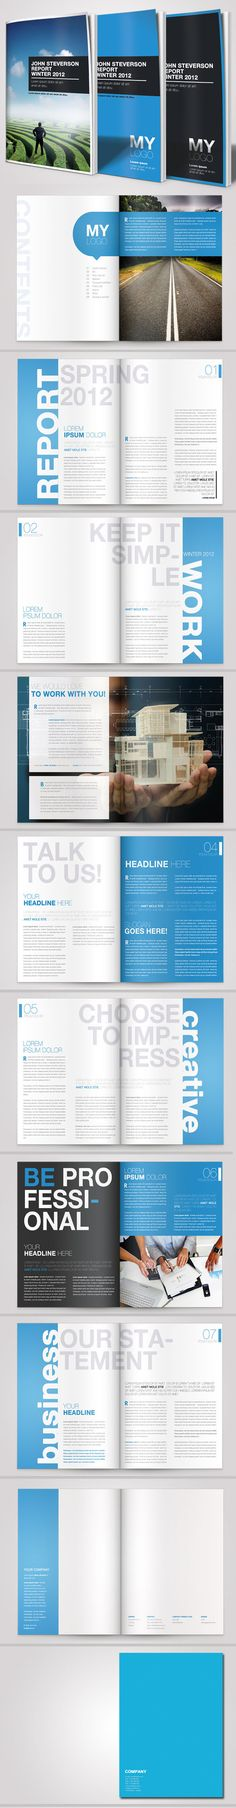 A4 Business Brochure Vol. 03 on Behance